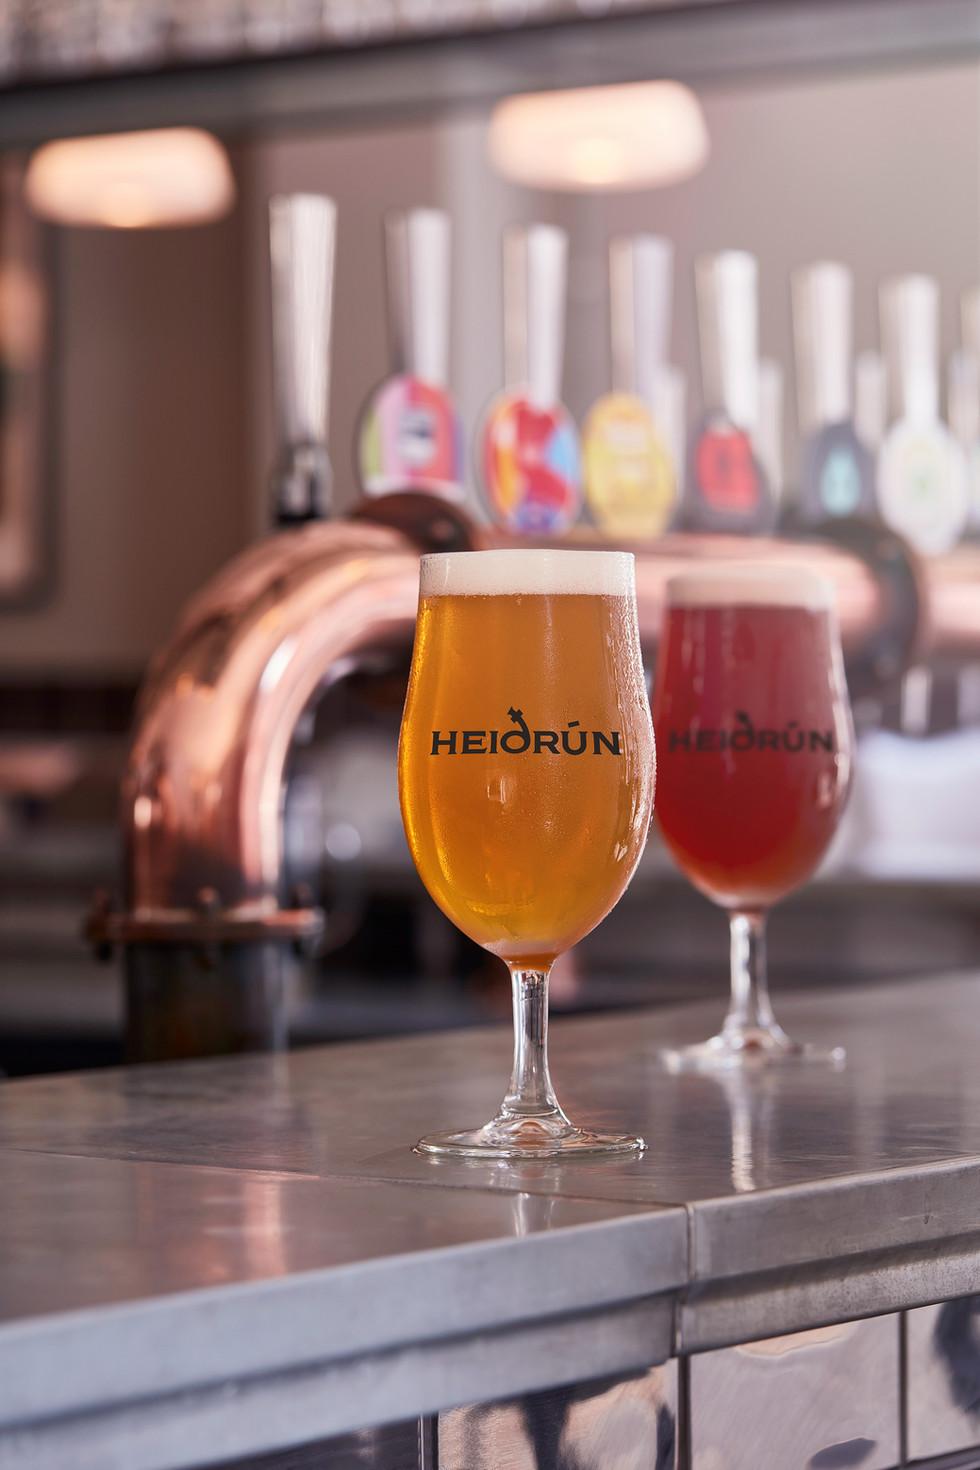 Heidrun-Gallery-Restaurant-shot1.jpg